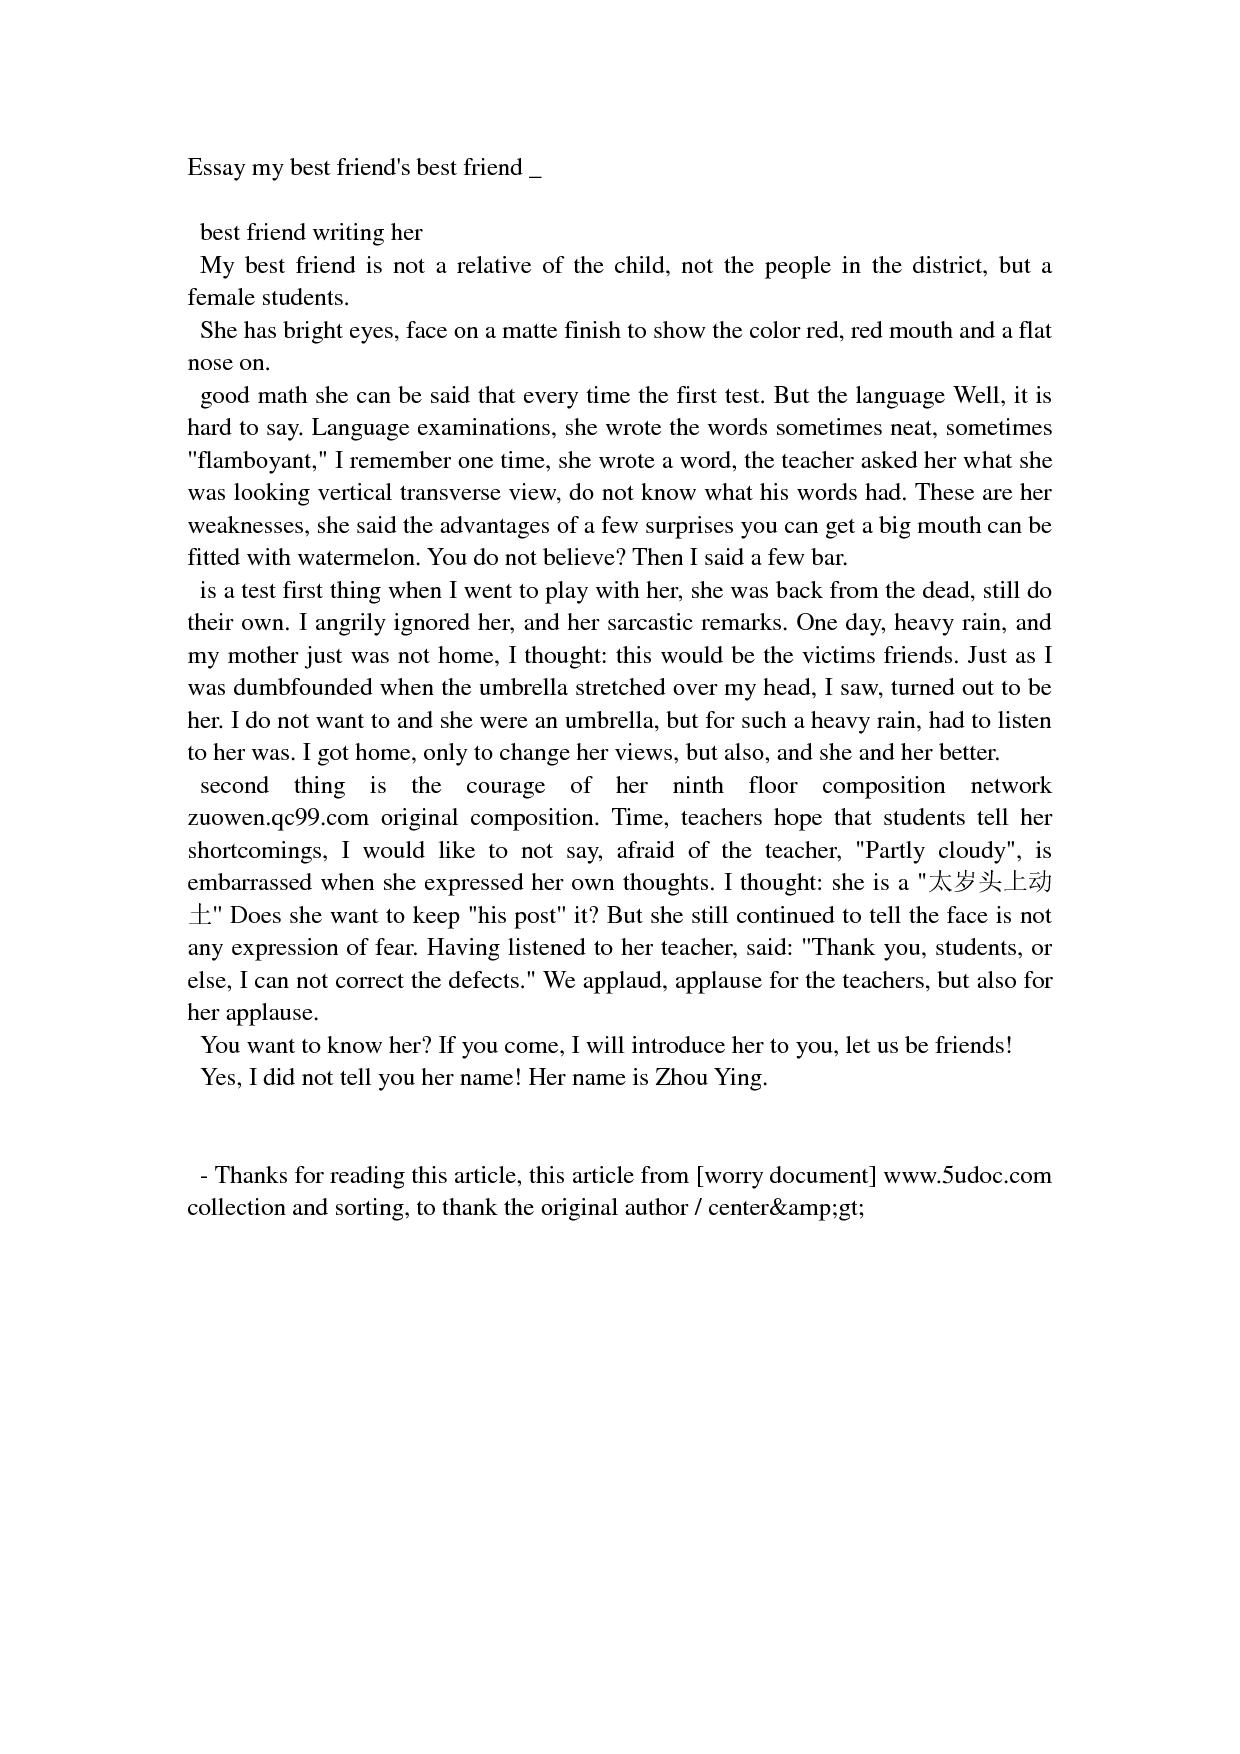 004 Essay Example Friendship Stunning Emerson Pdf By Ralph Waldo Analysis Title Ideas Full